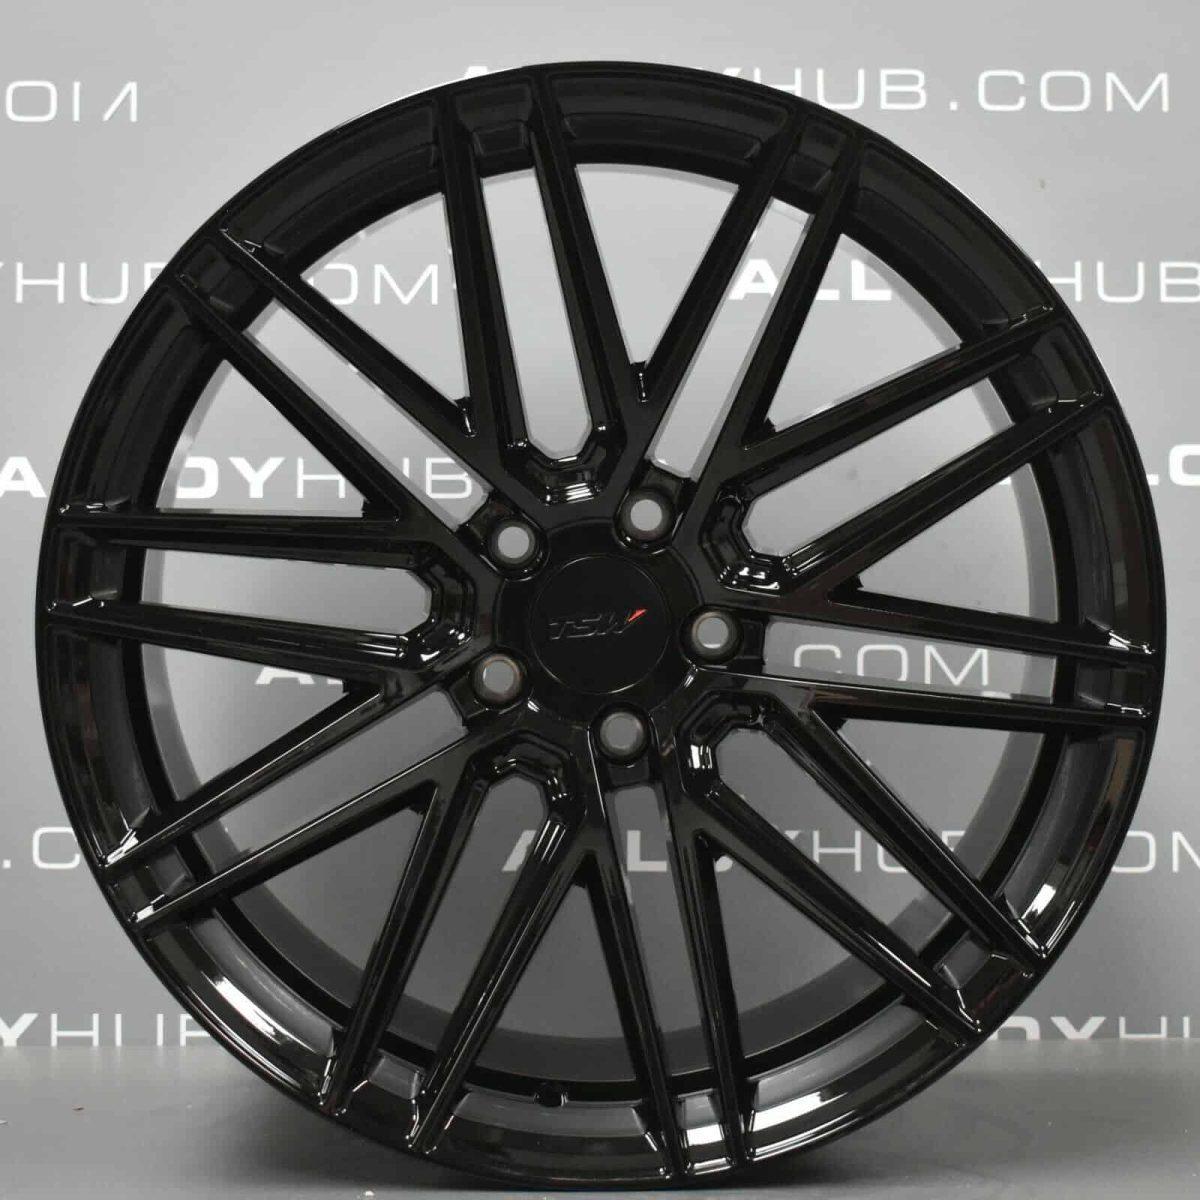 "Genuine VEA TSW Volkswagen Amarok 20"" Inch Alloy Wheels with Gloss Black Finish"